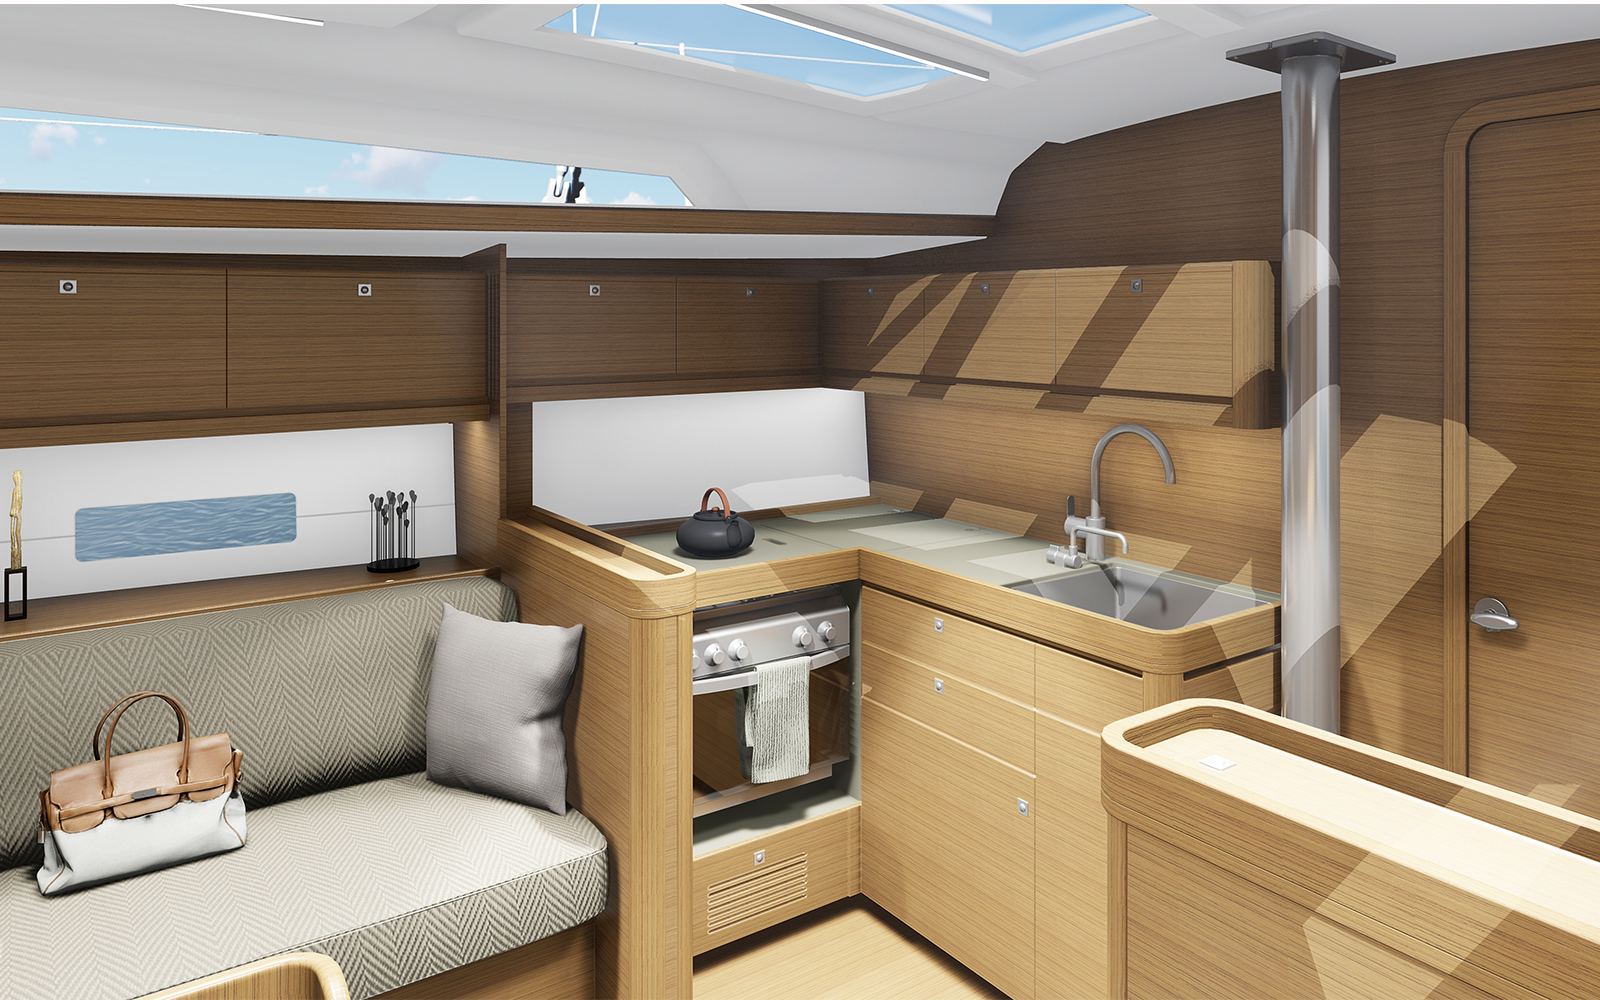 Modelo 4 - Boat Shopping